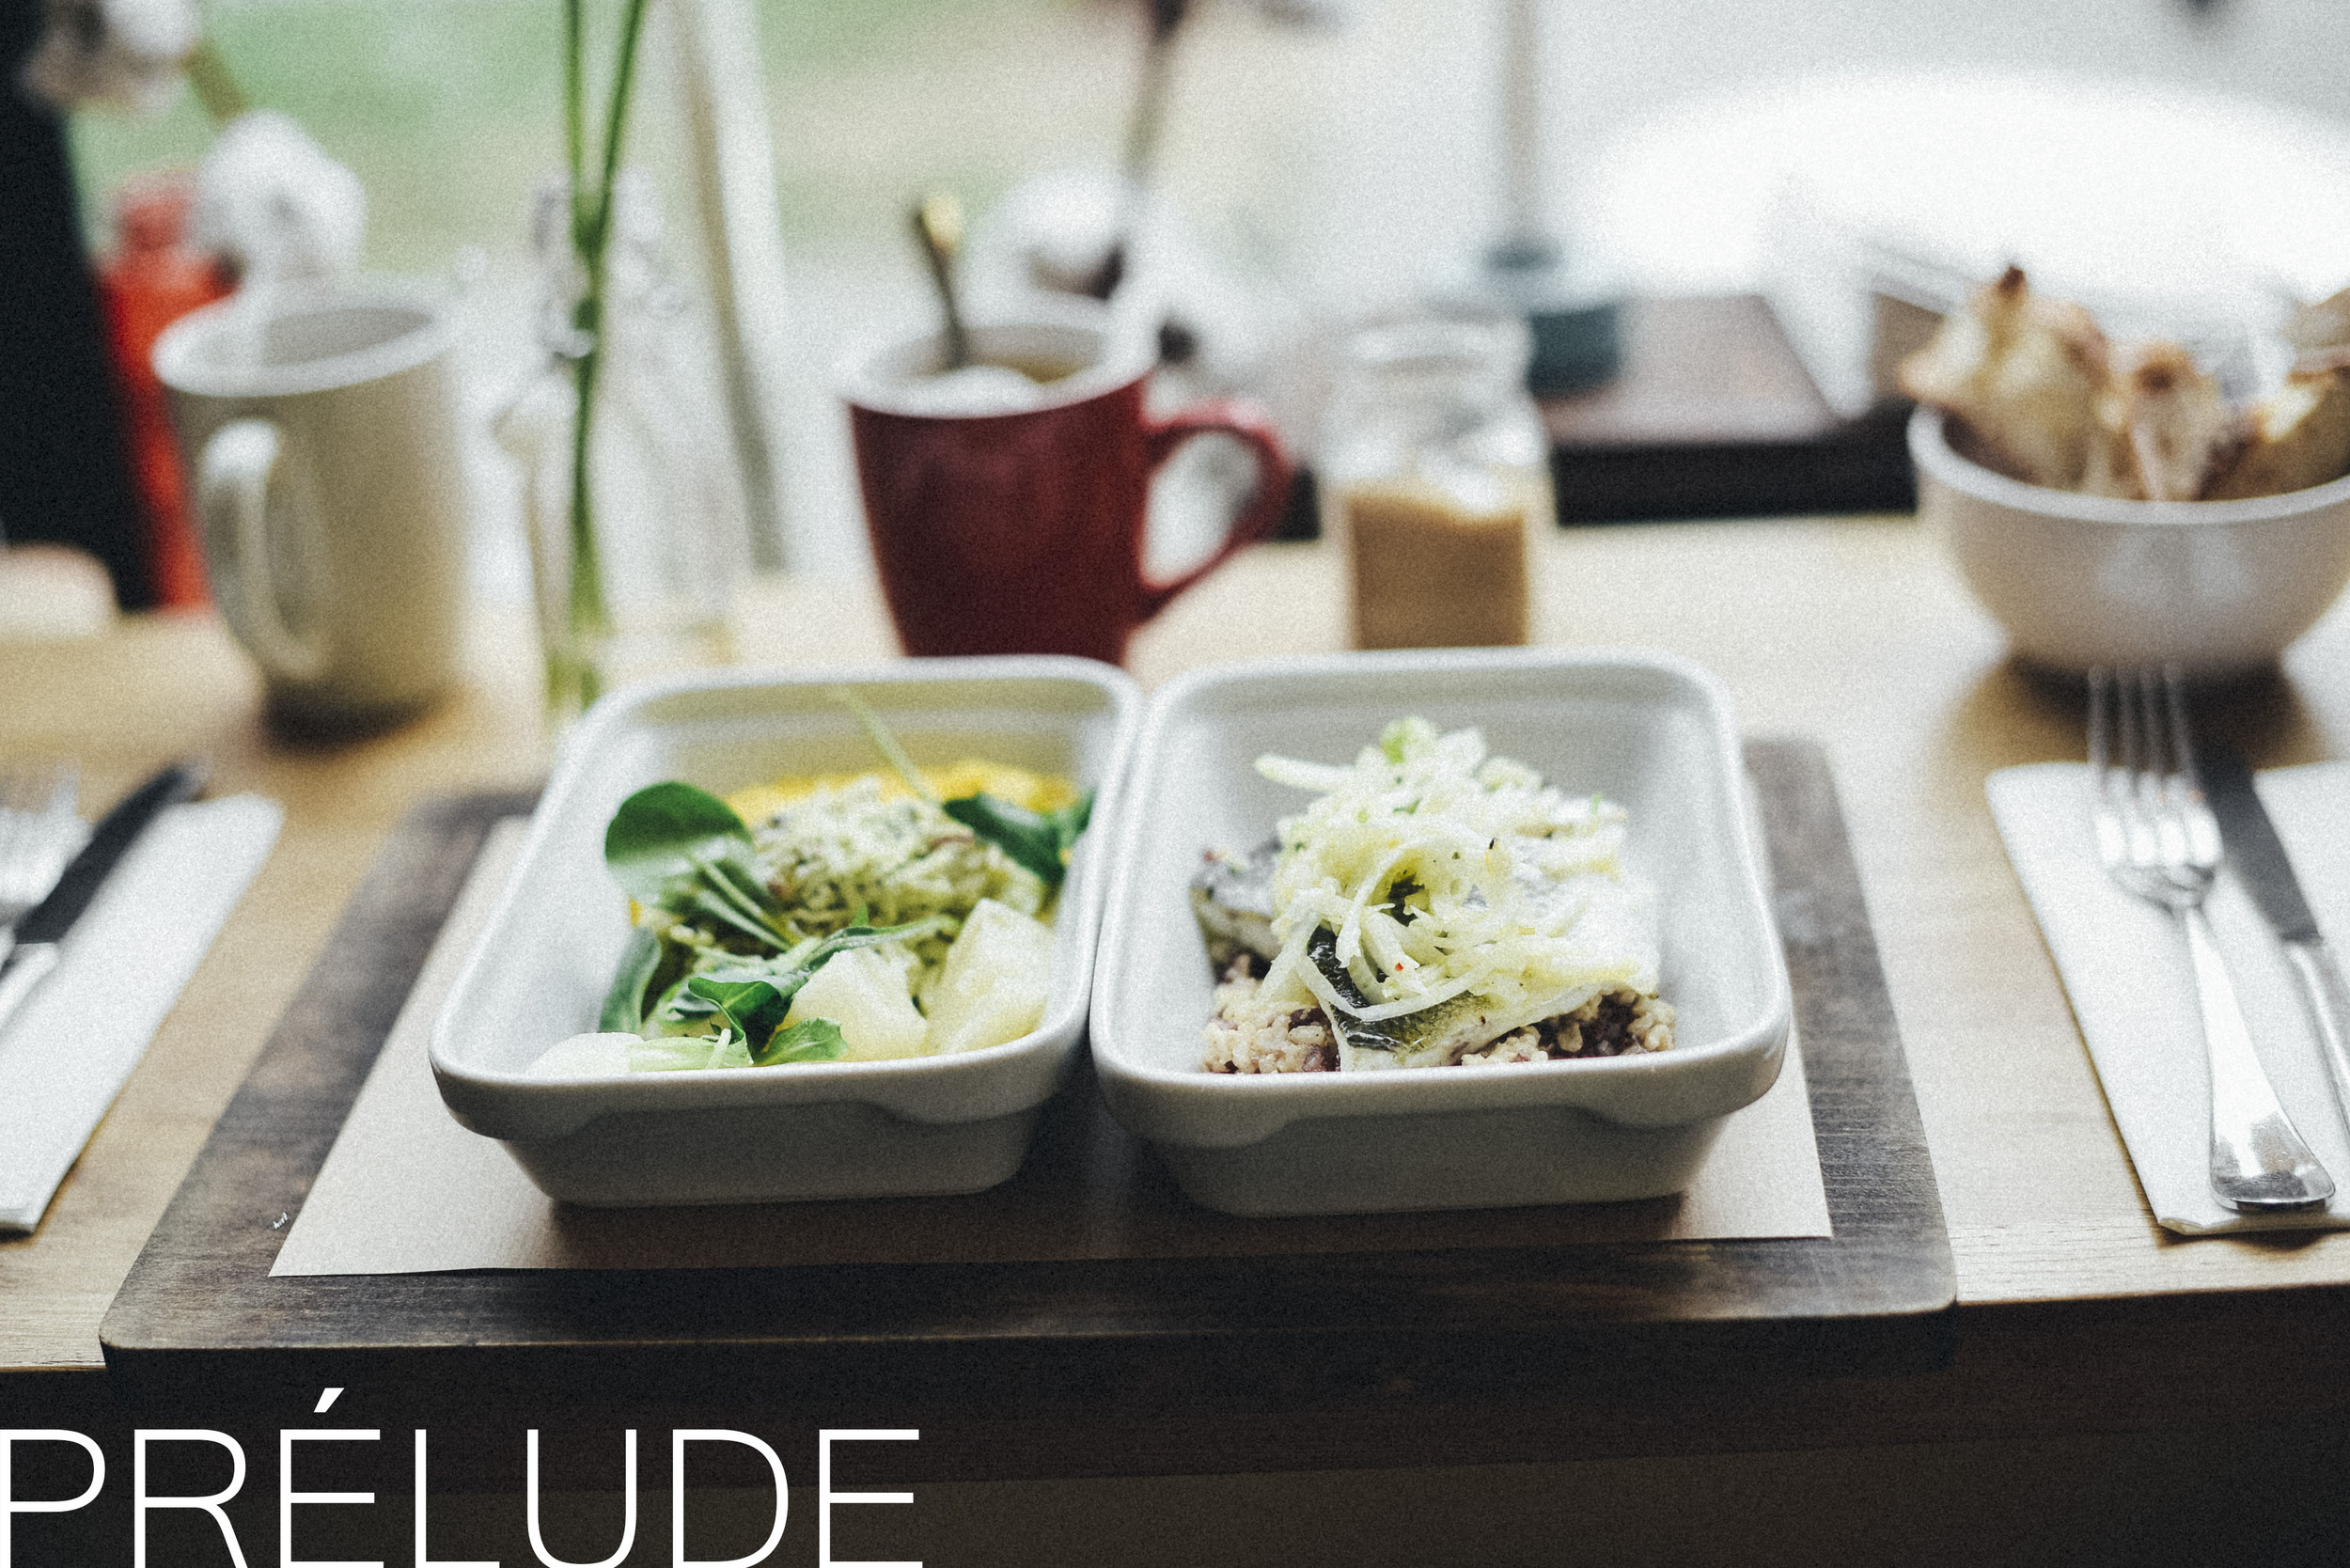 prélude brussels lunch organic vegan veggie fish meat fresh food